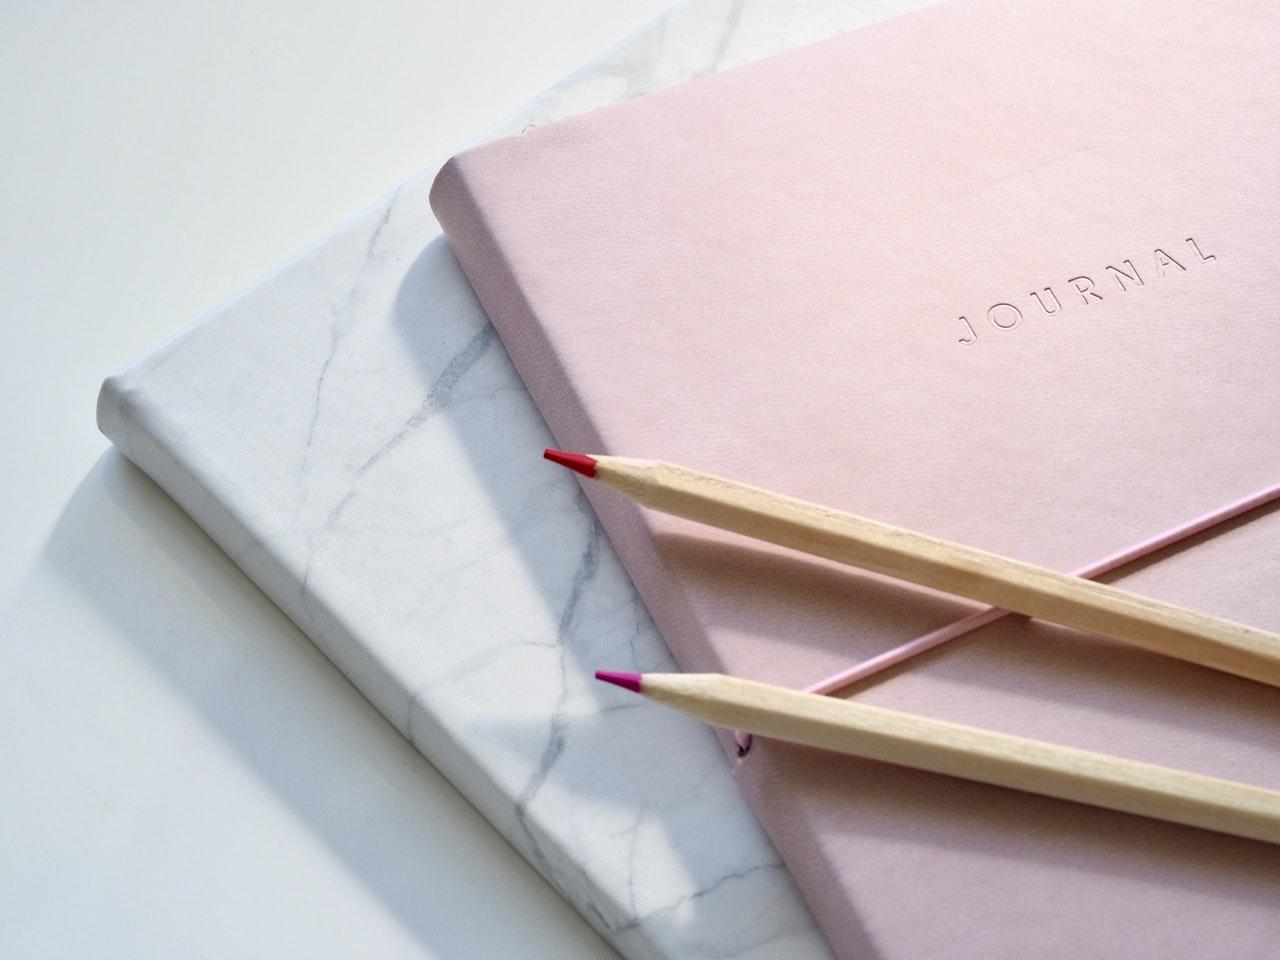 closeup-photo-of-journal-book-and-pencils-1018133.jpg